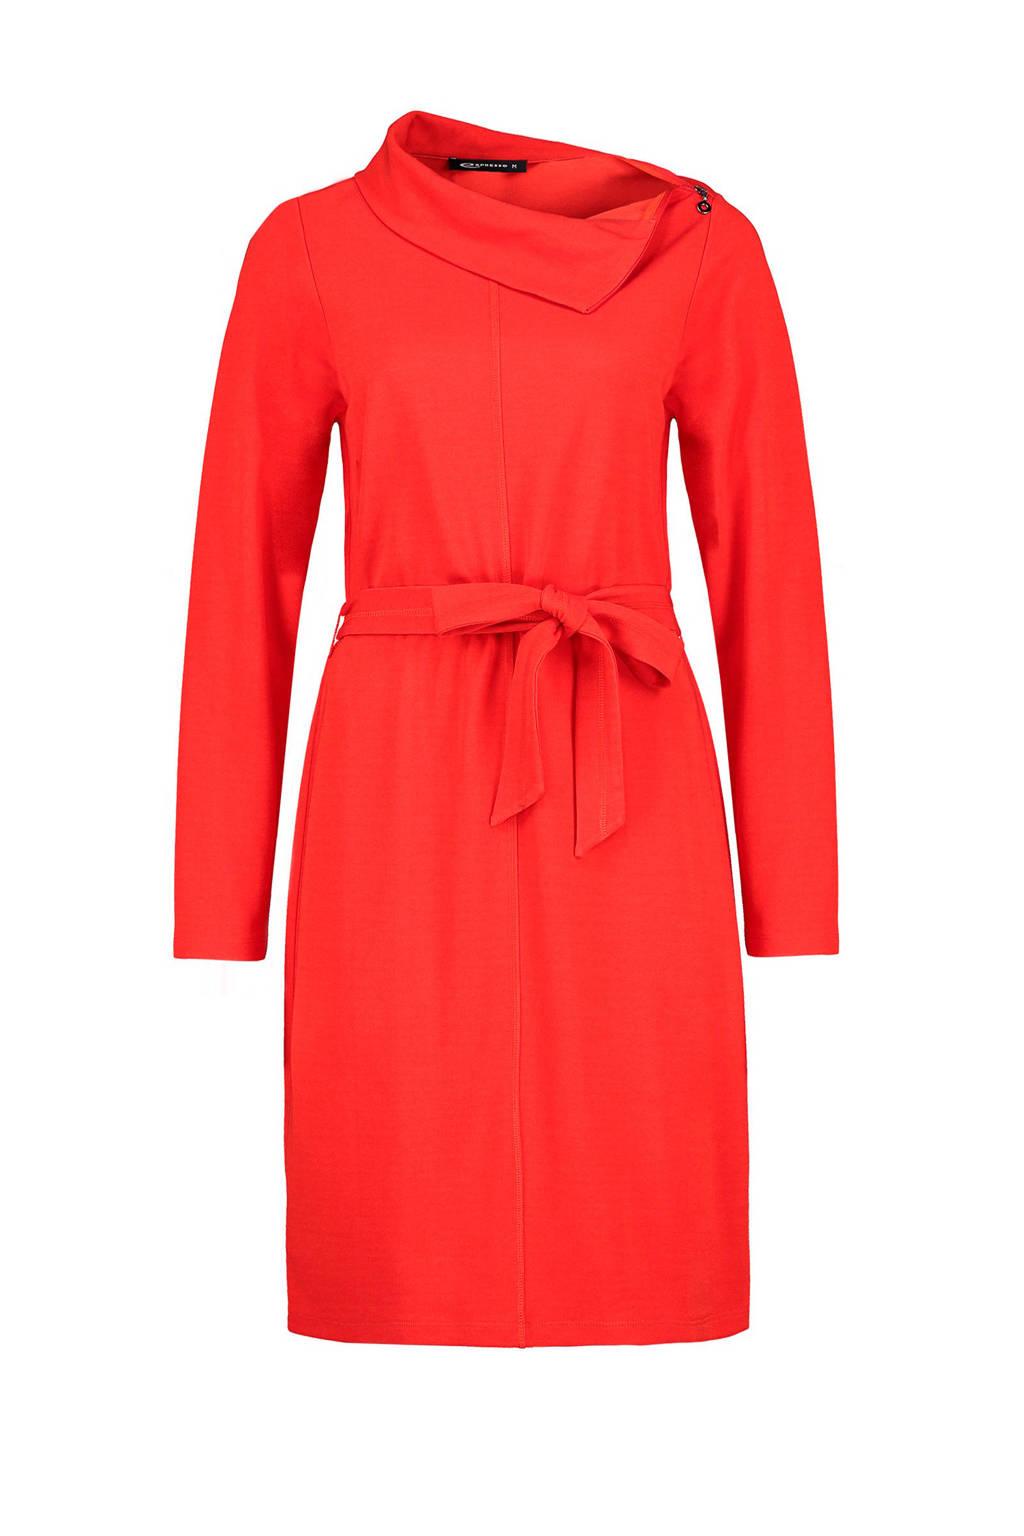 Expresso jurk met ceintuur rood, Rood